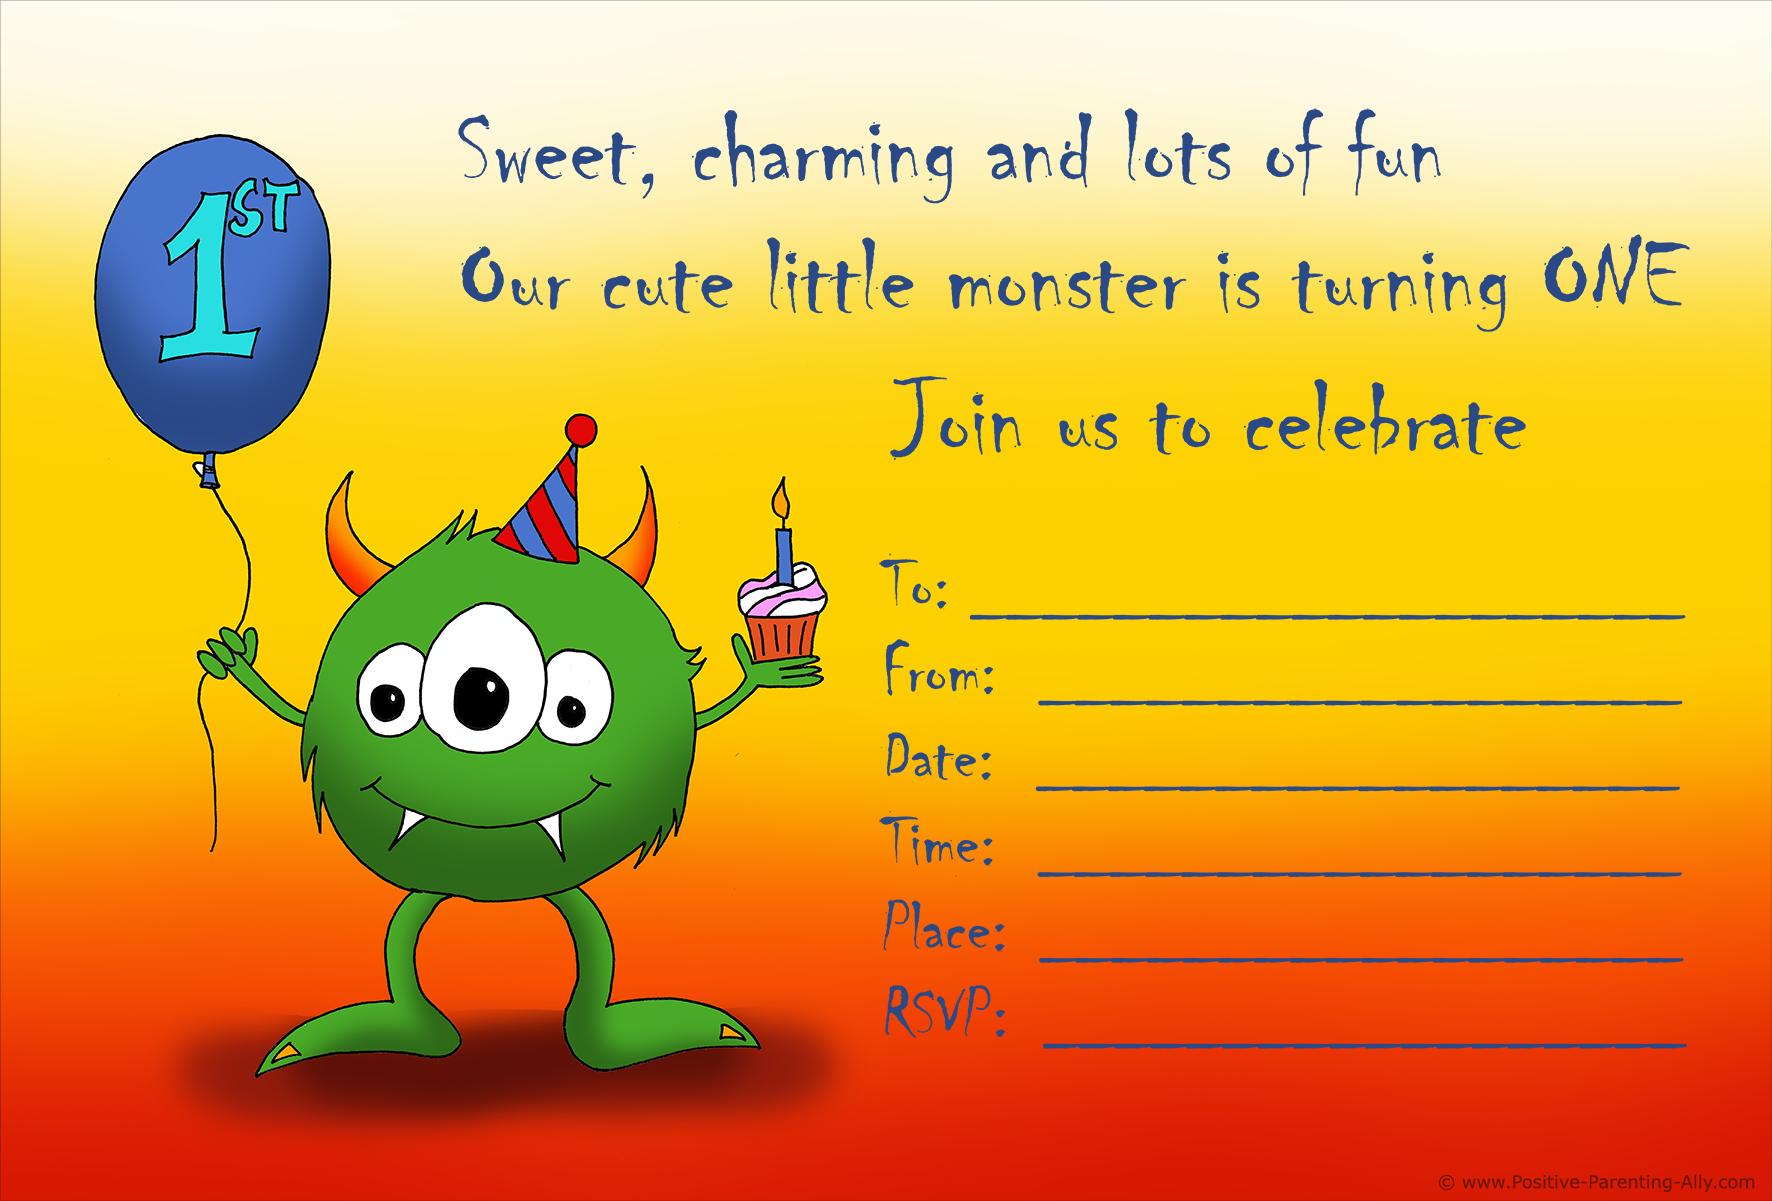 Cute monster birthday invitation to print. Celebrating the first birthday.